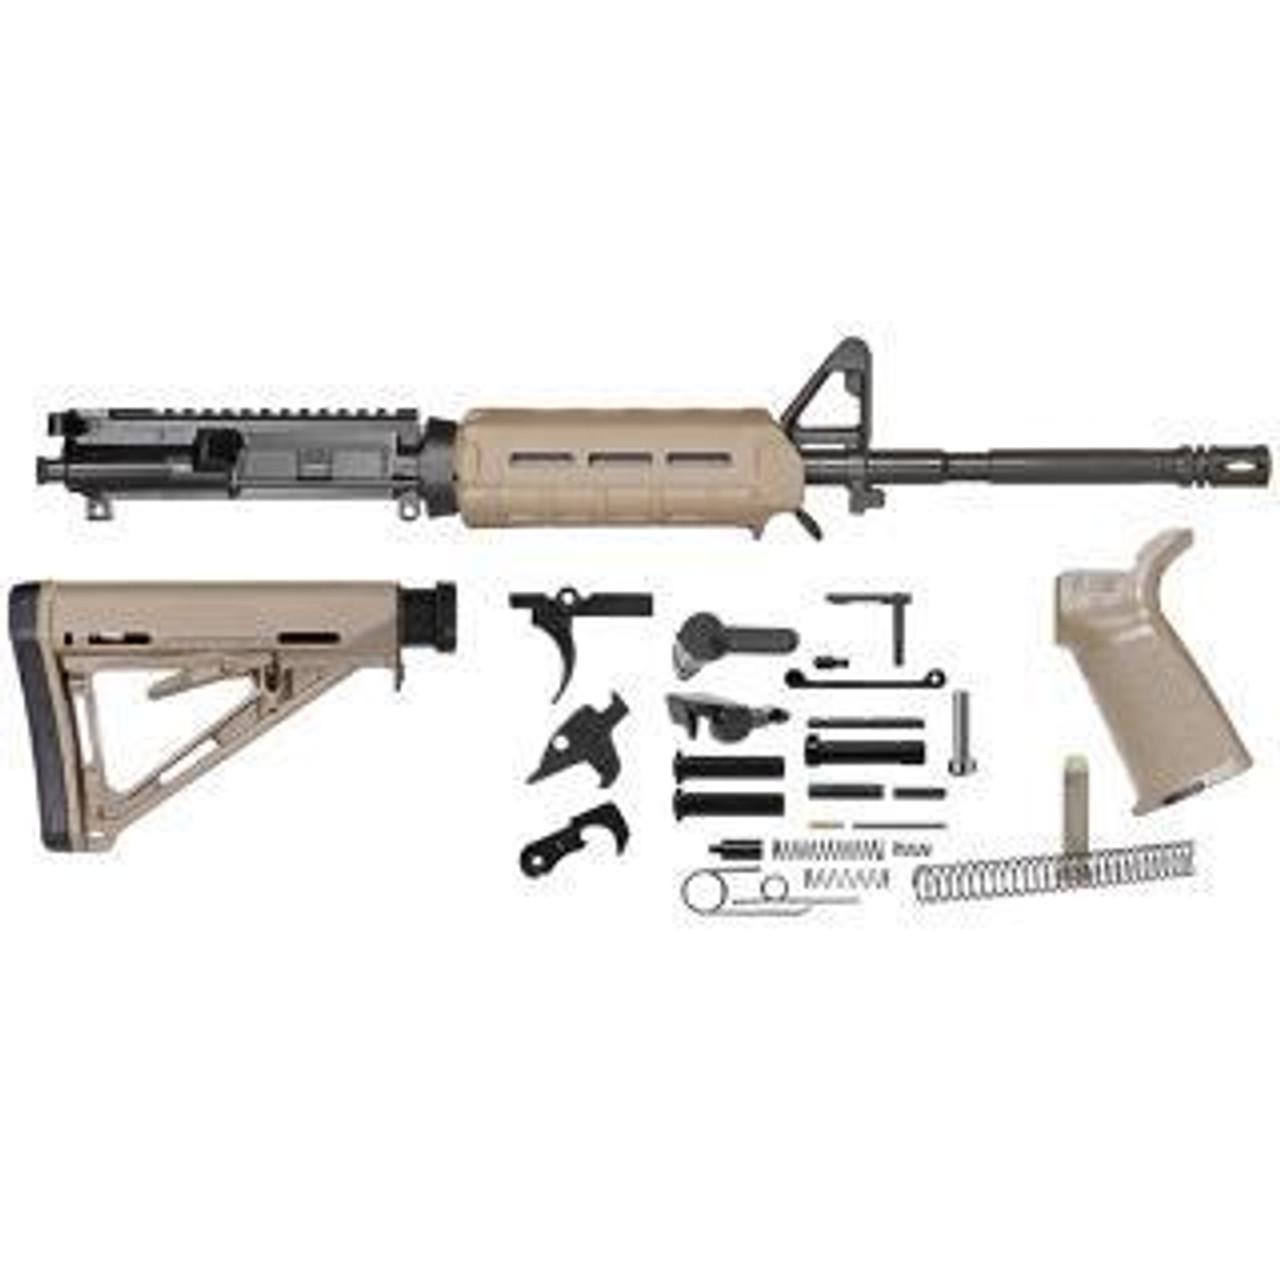 Del Ton Rifle Kit- M4 FDE Magpul Furniture- CALIFORNIA LEGAL- 5.56